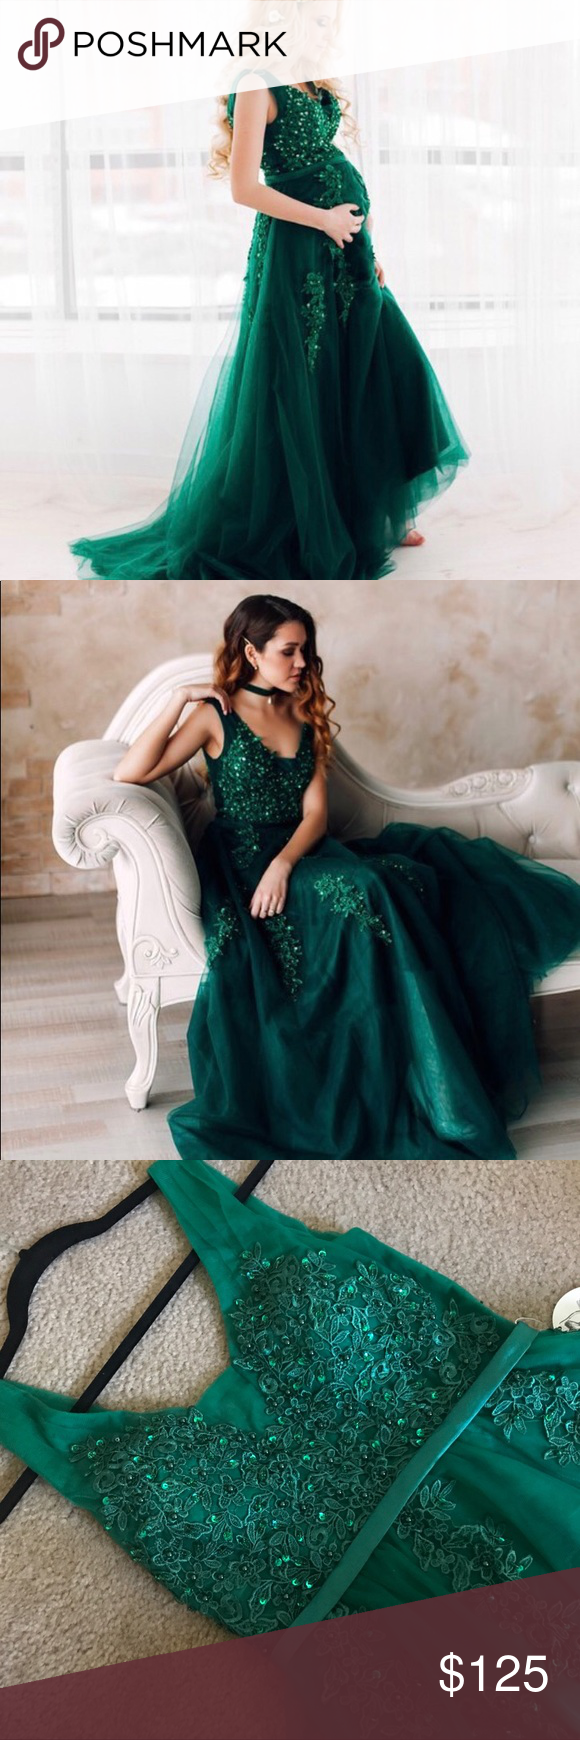 53fad1110d4e9 Evening promo dress , ball gown 2017 maternity Boutique   A list of ...